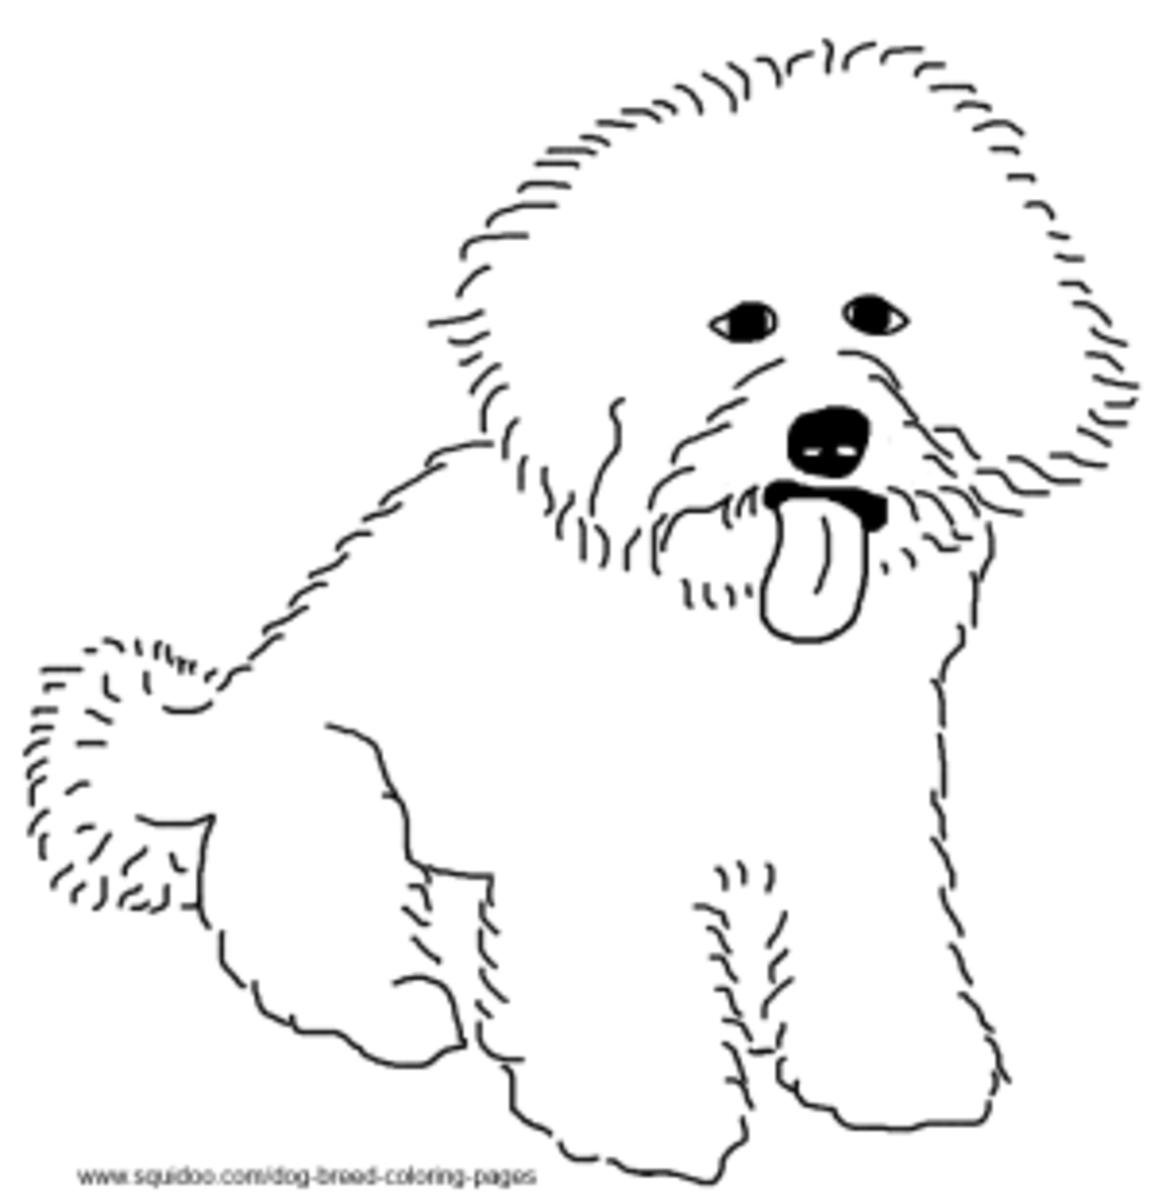 Bichon Frise coloring page